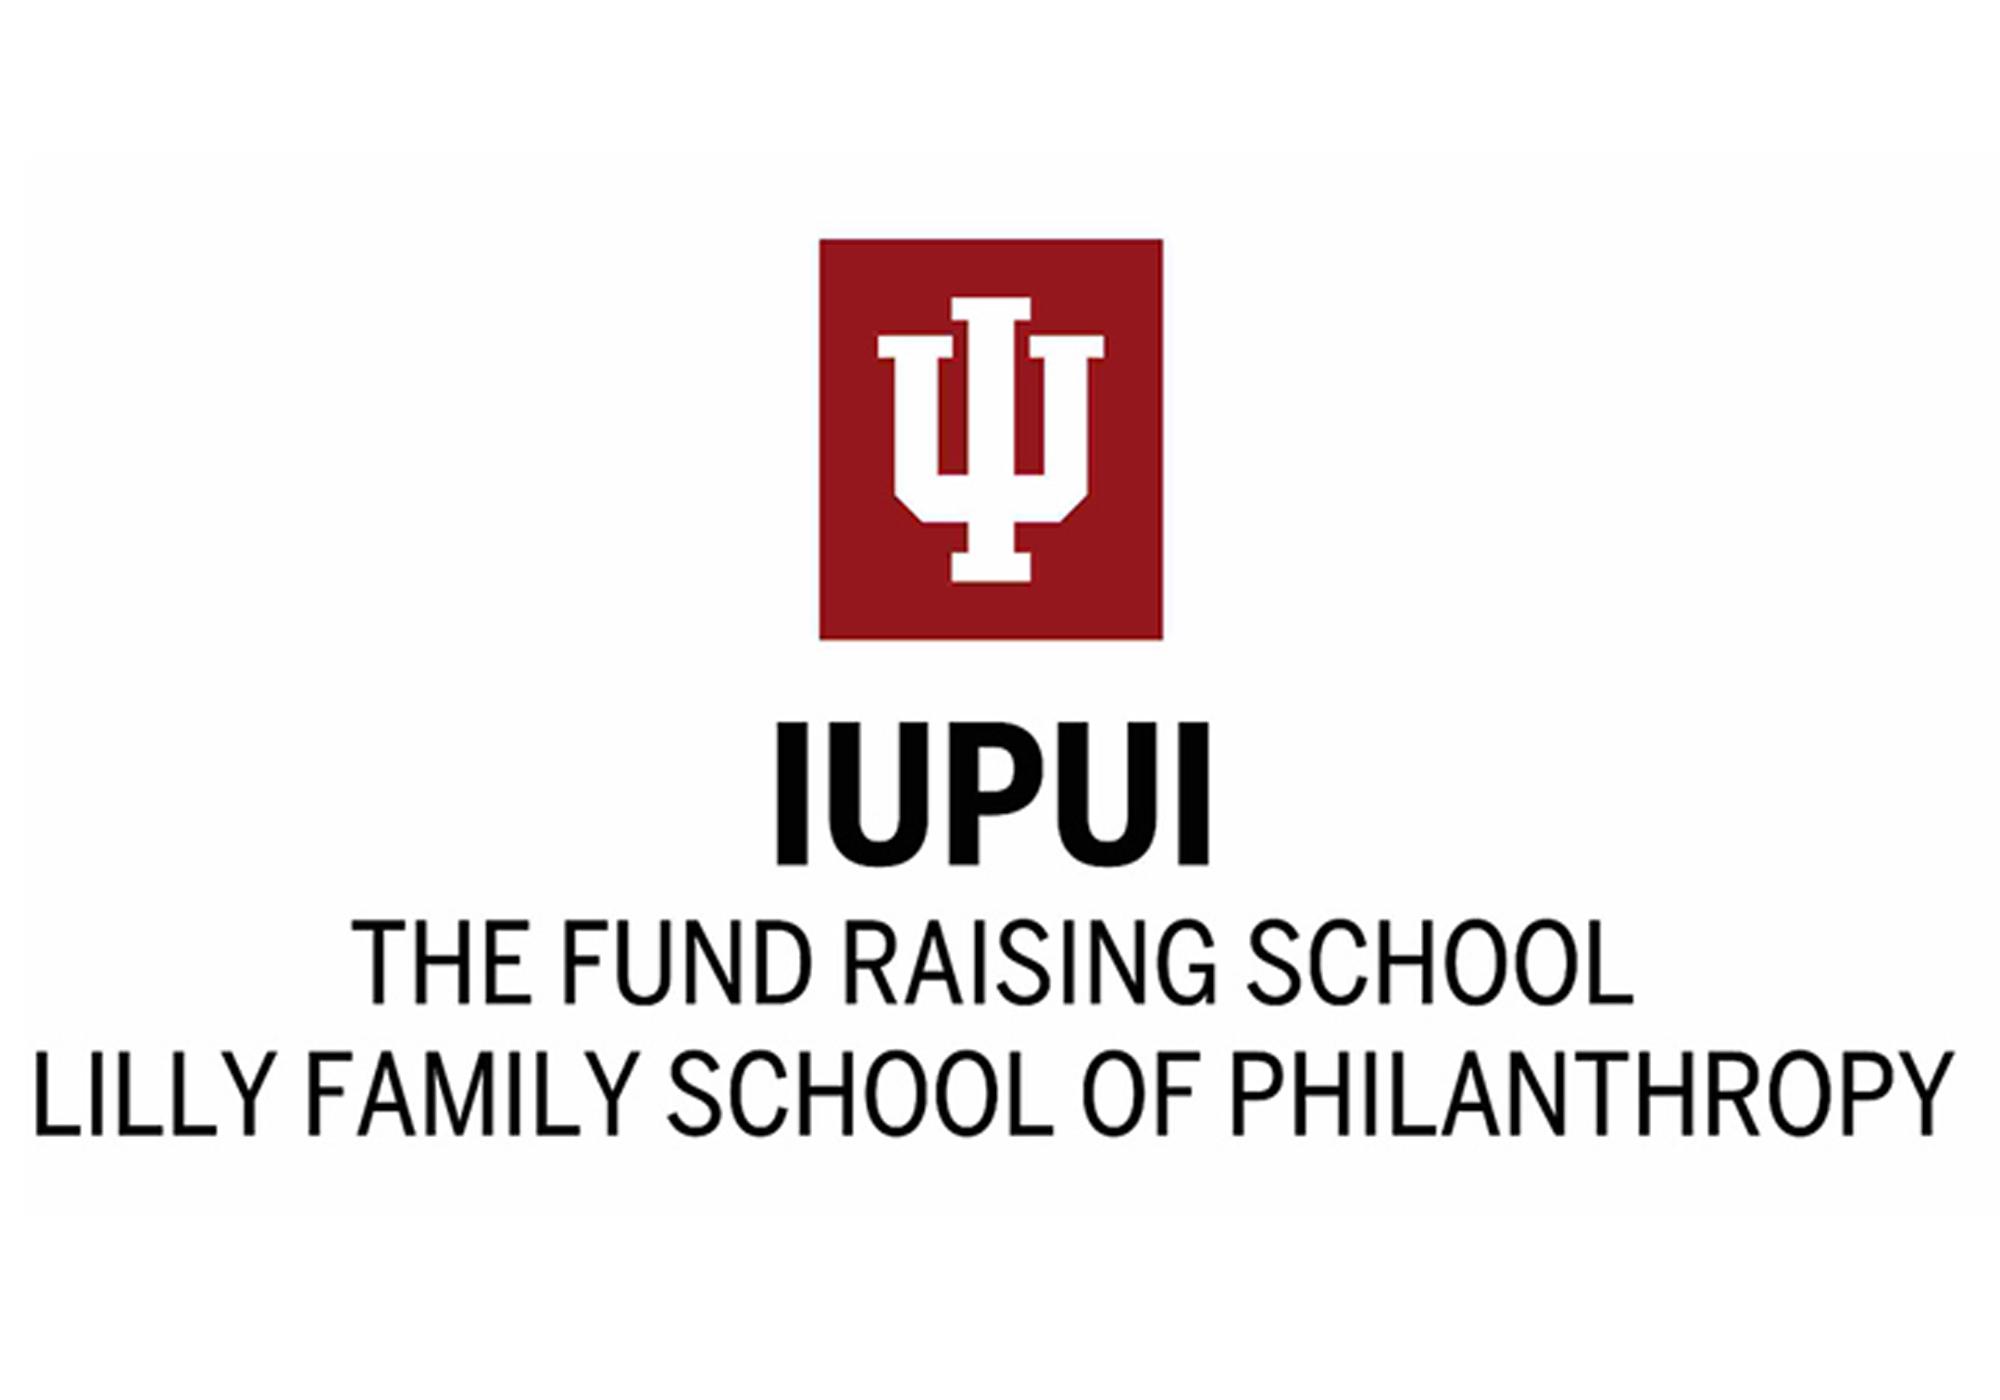 HCCF Announces Partnership with The Fund Raising School